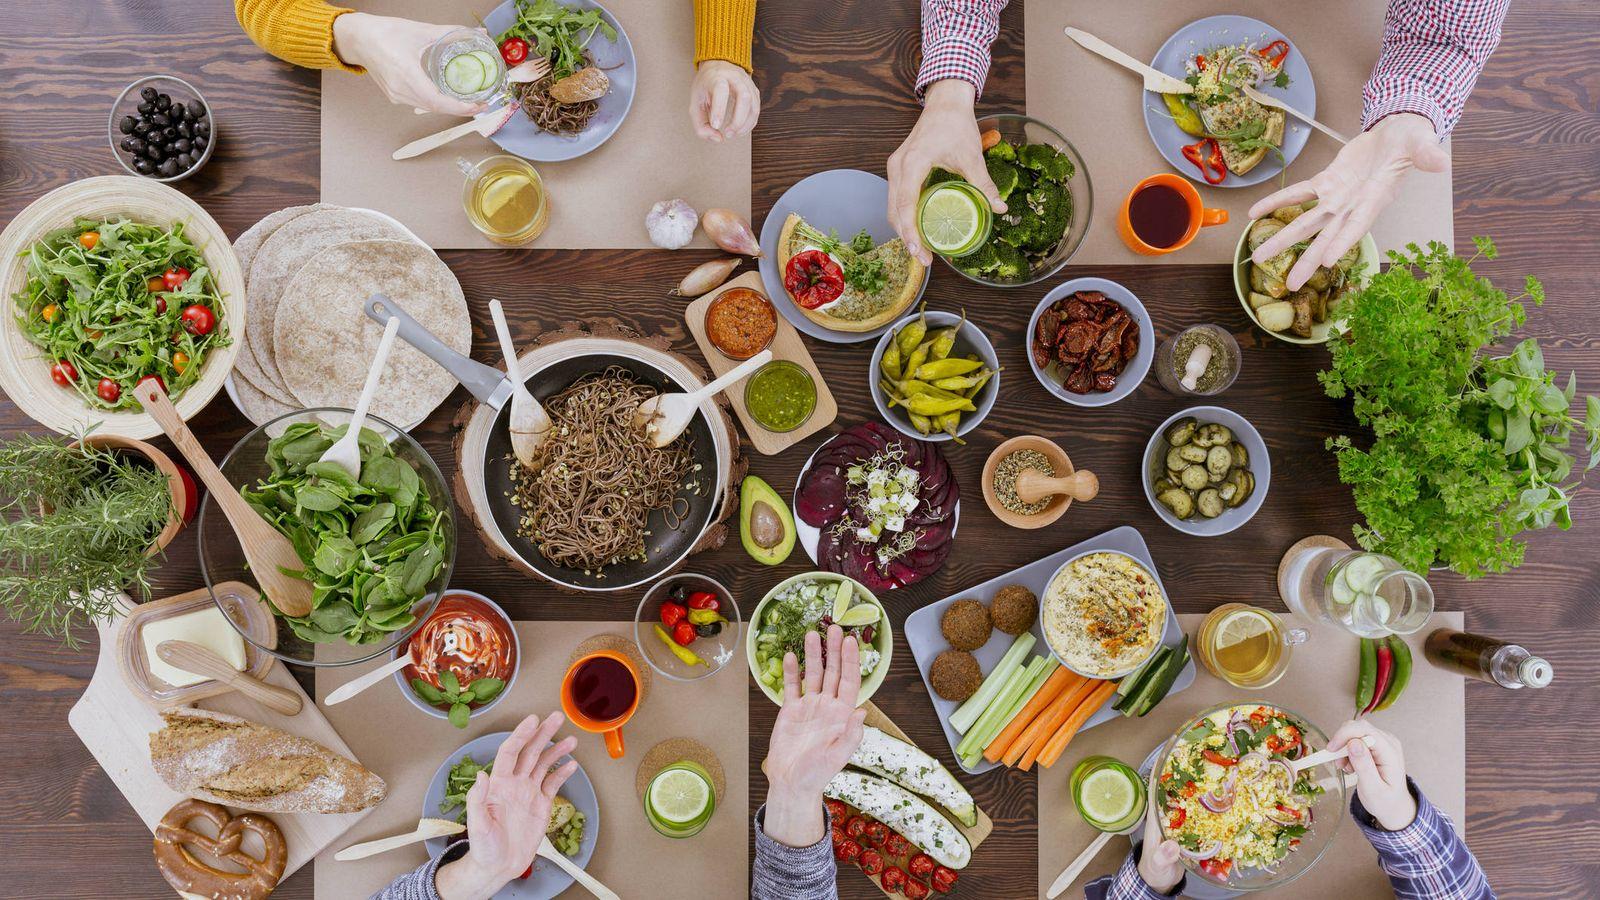 Foto: Momentos para comer en compañía. (iStock)